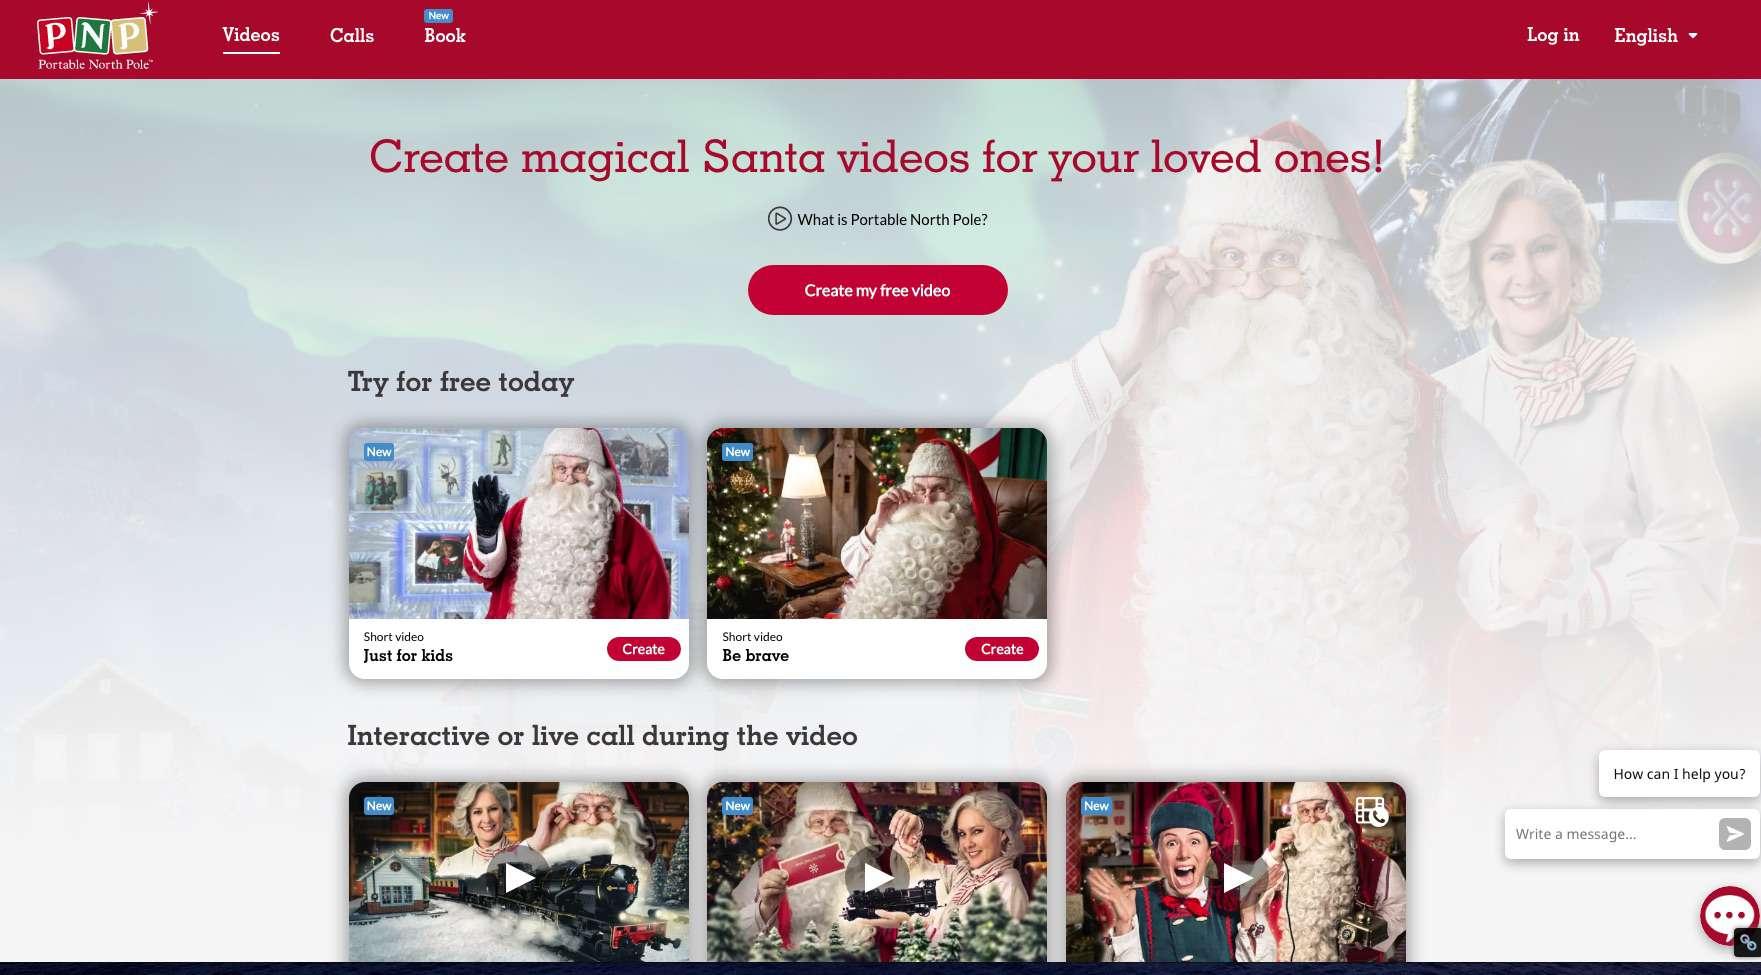 Make a free video at Portable North Pole